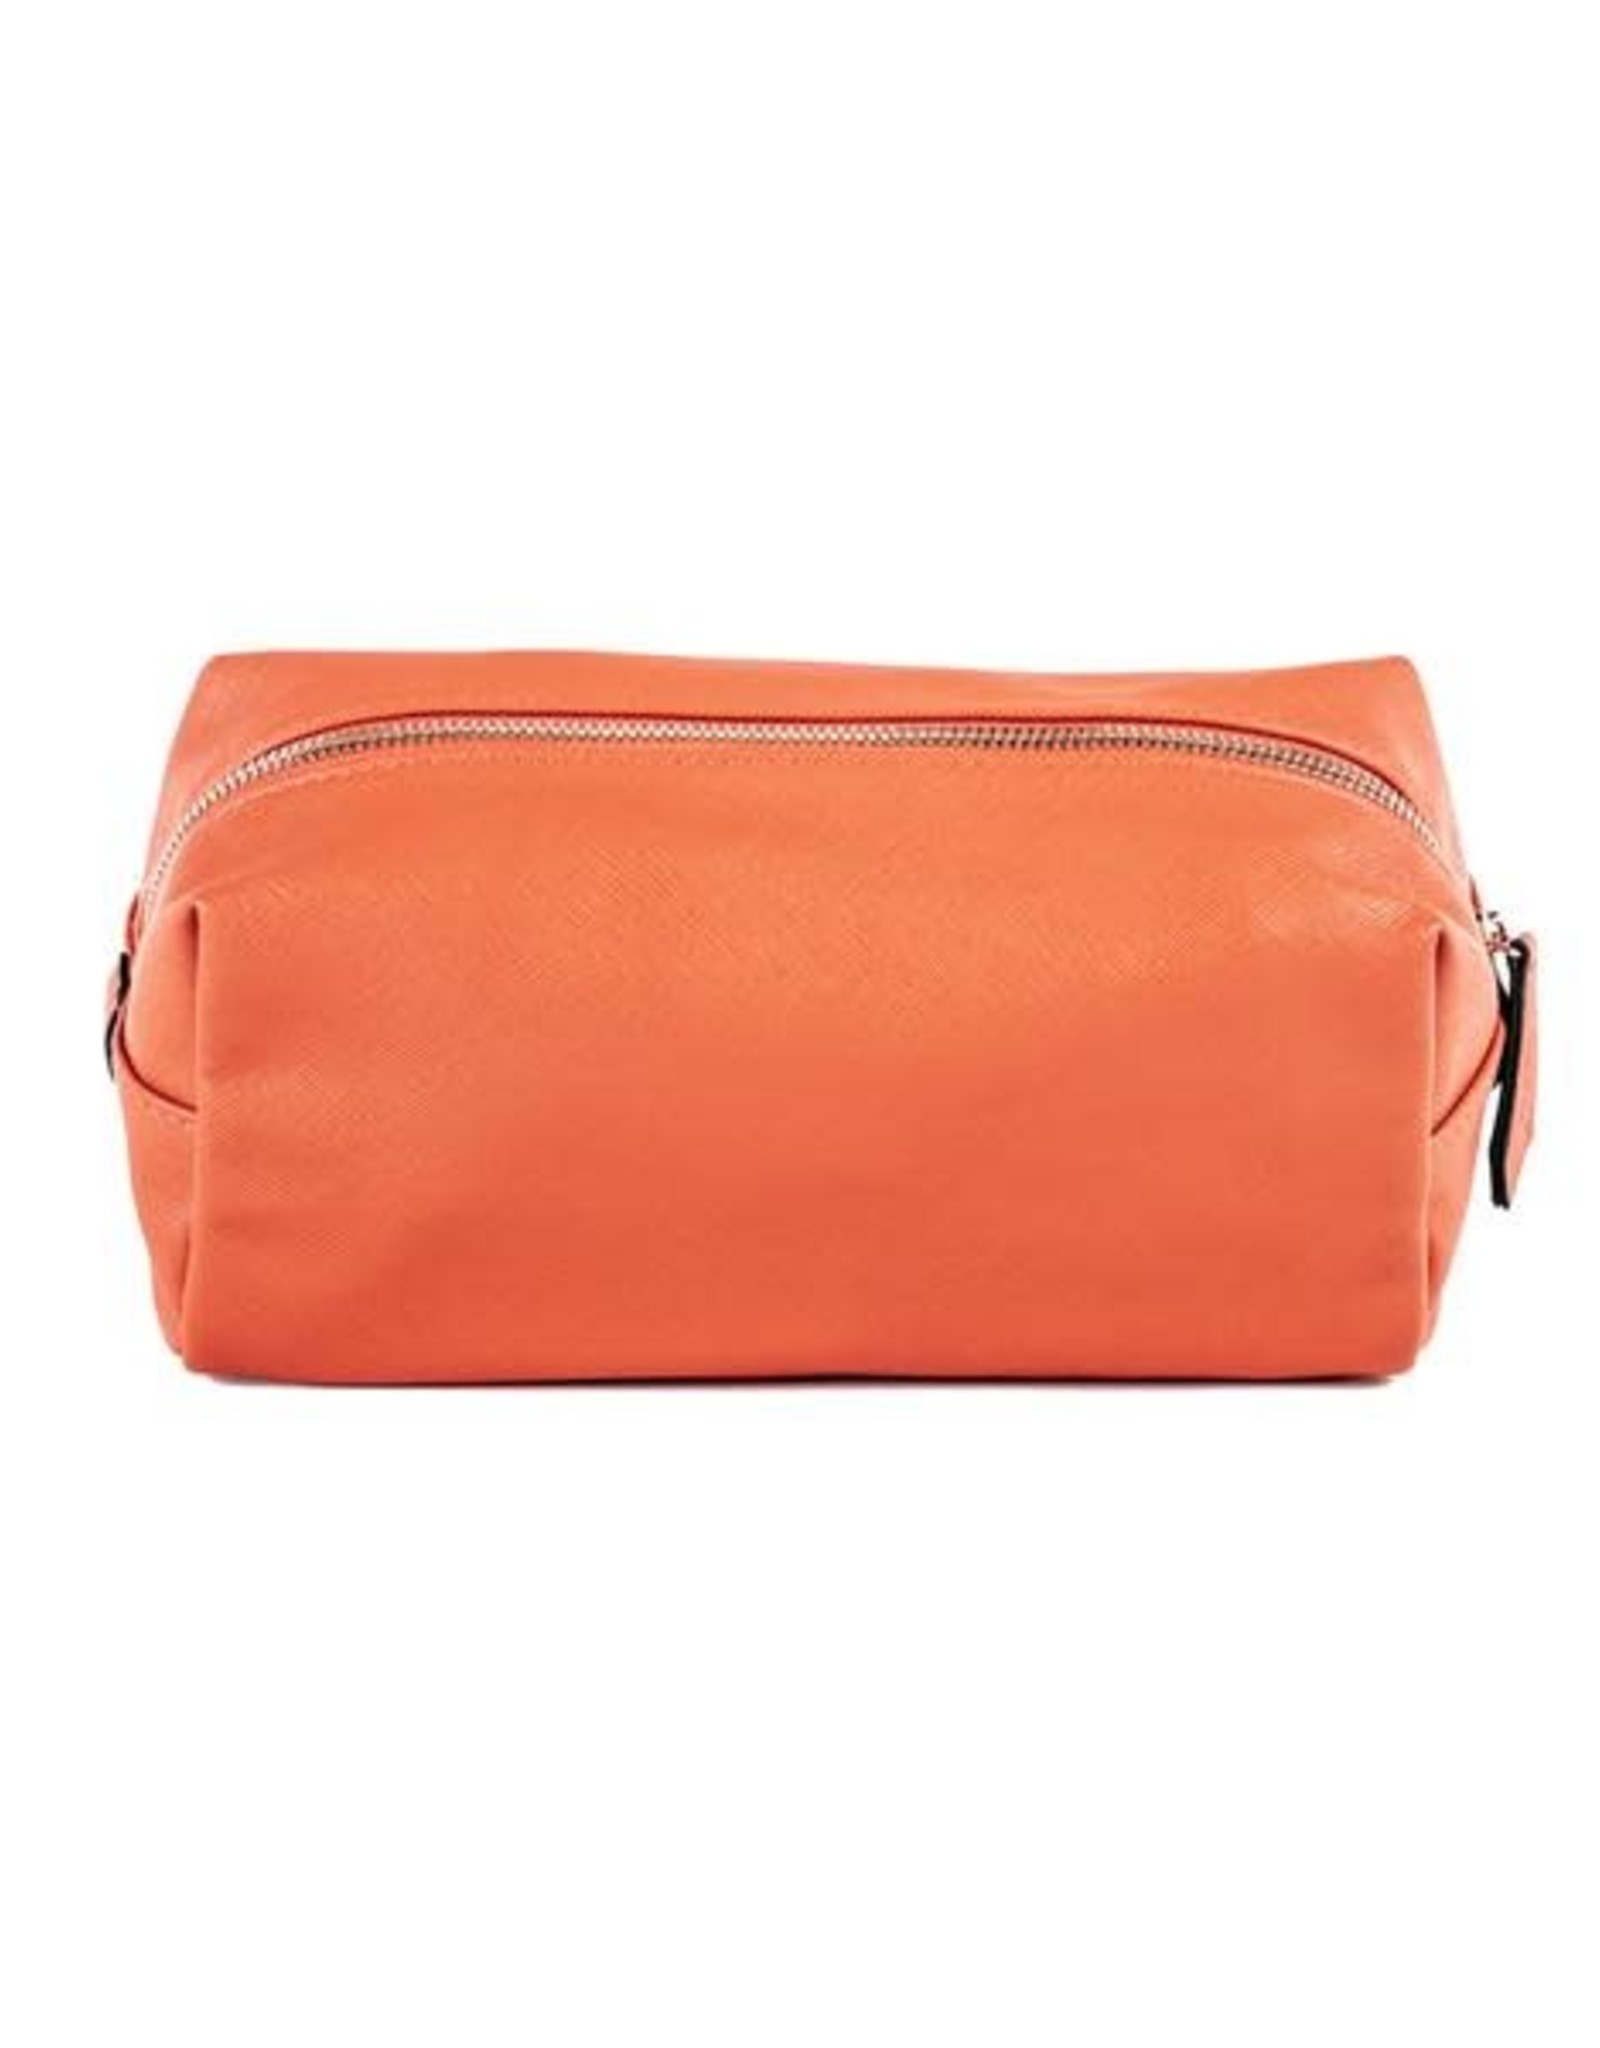 Brouk & Co Alexa Toiletry Bag Orange